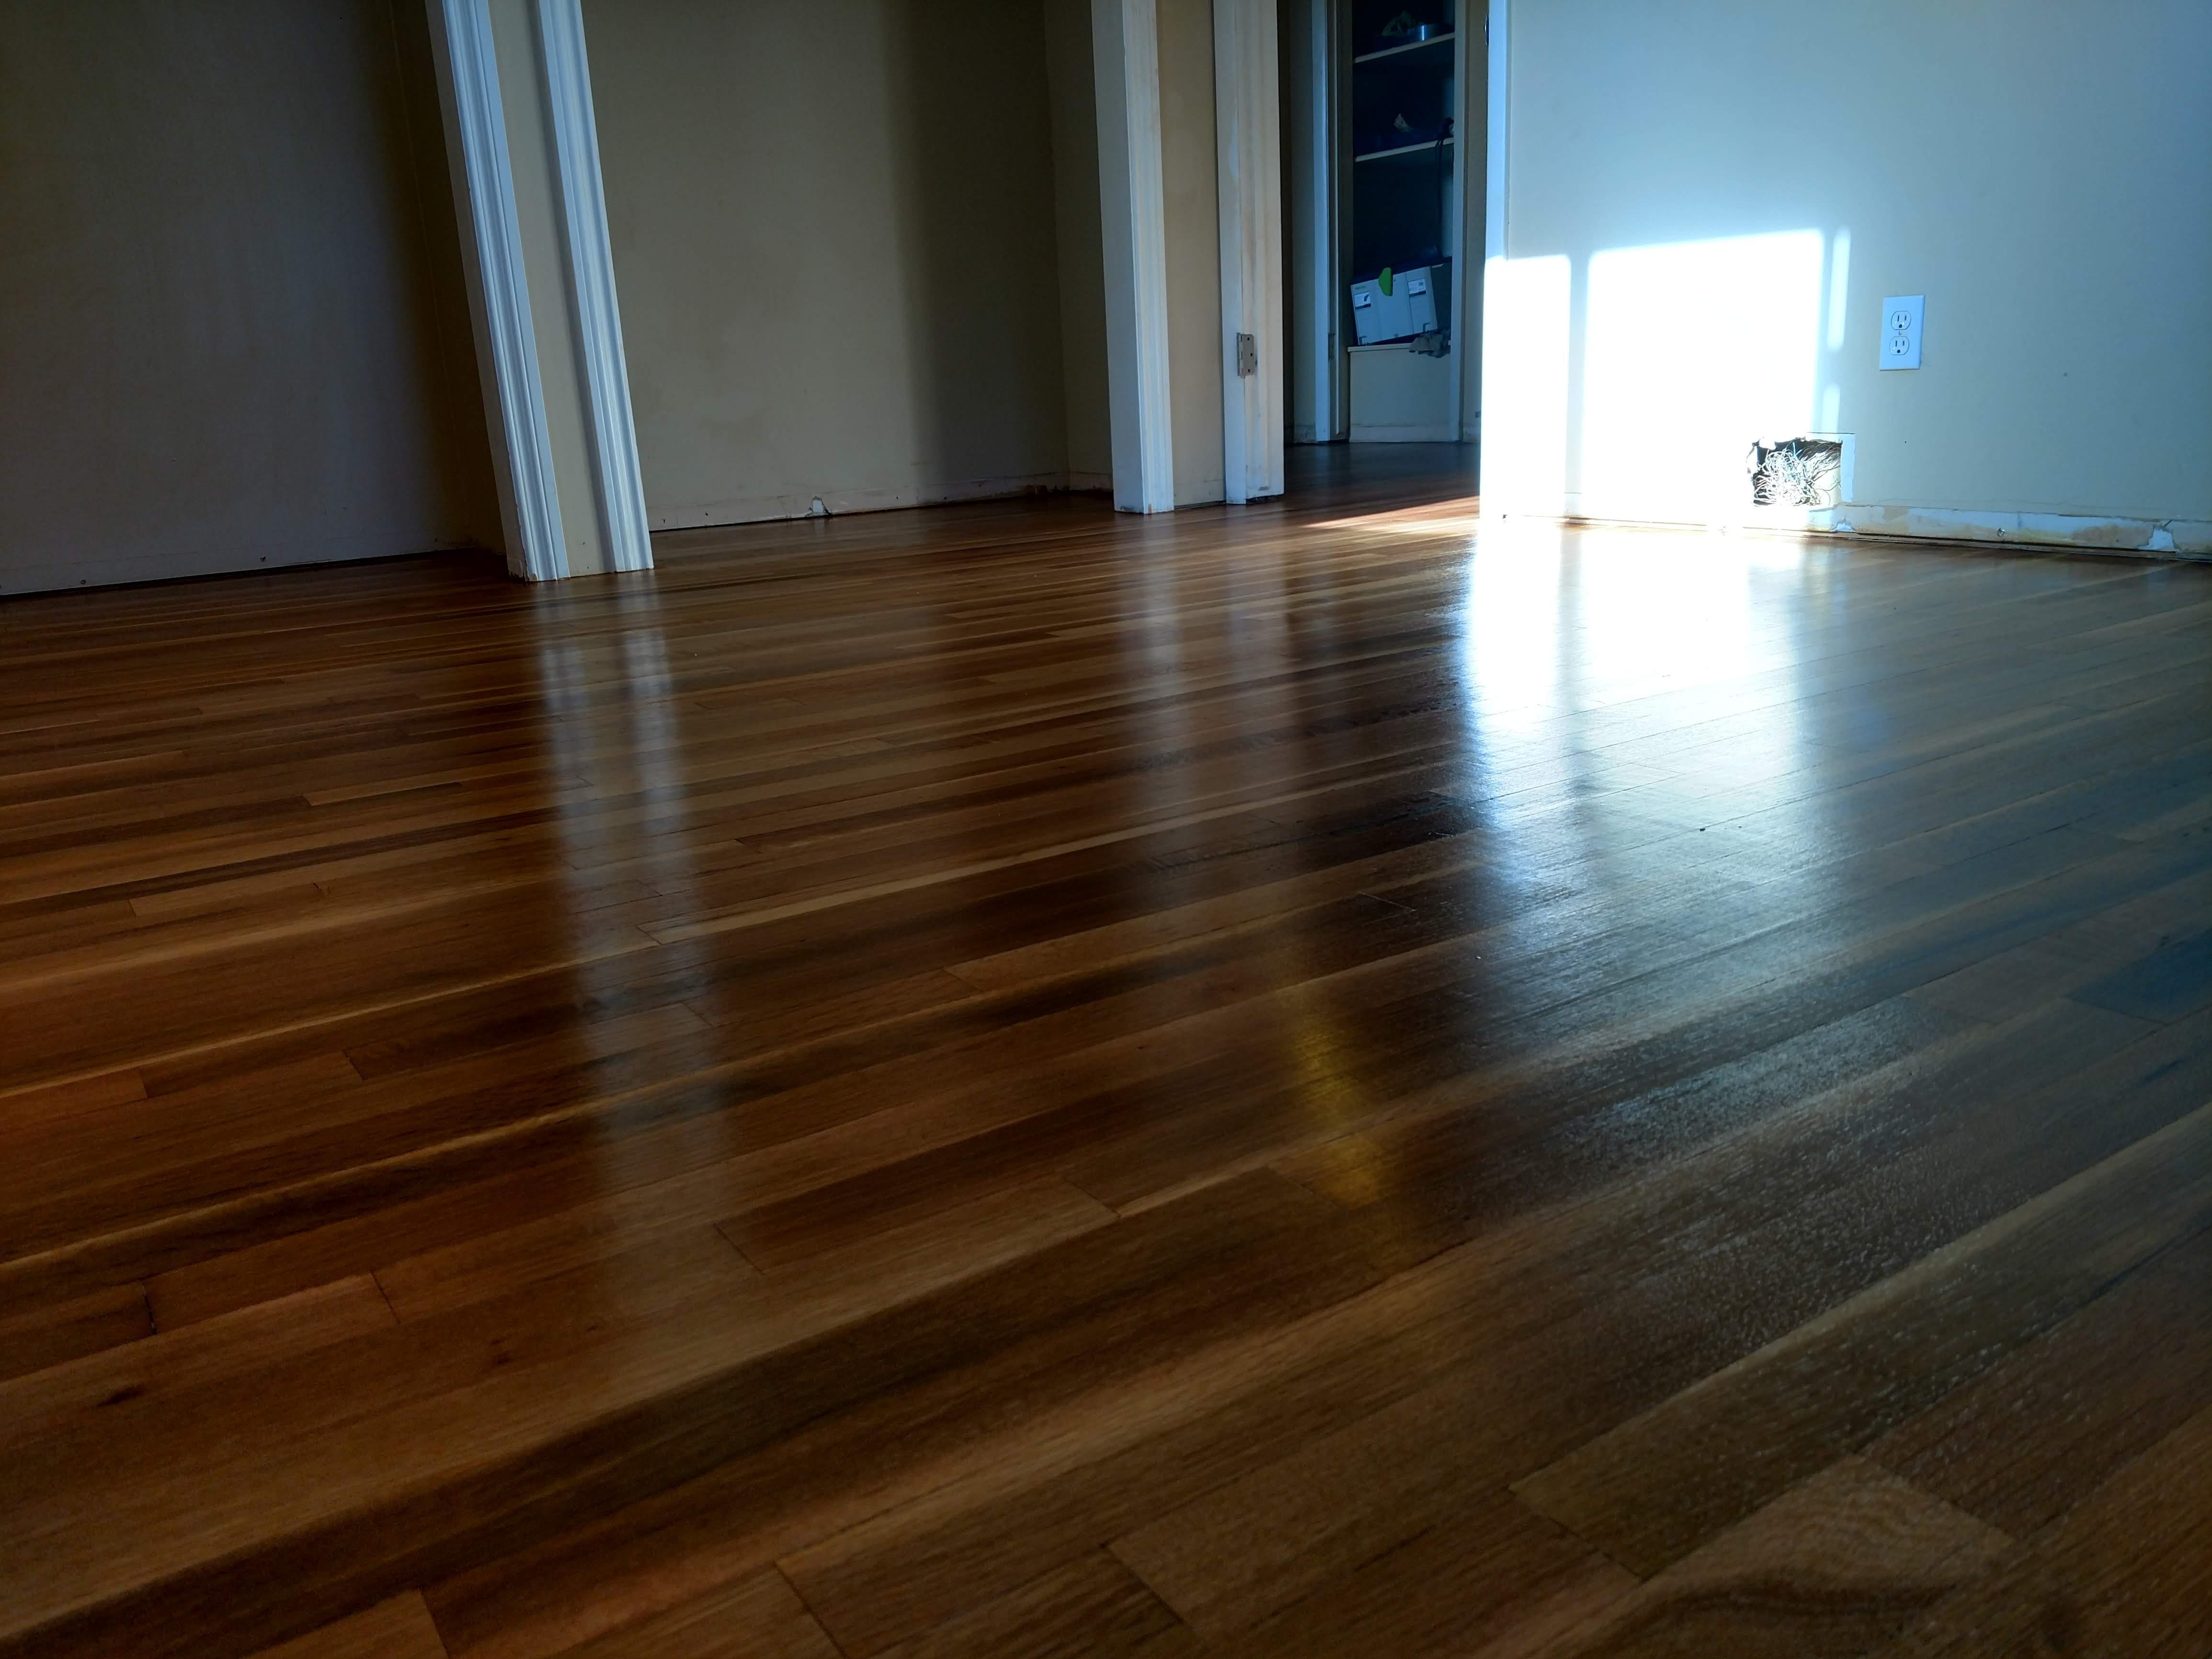 Flooring Found Hardwood Floors Underneath Carpet But